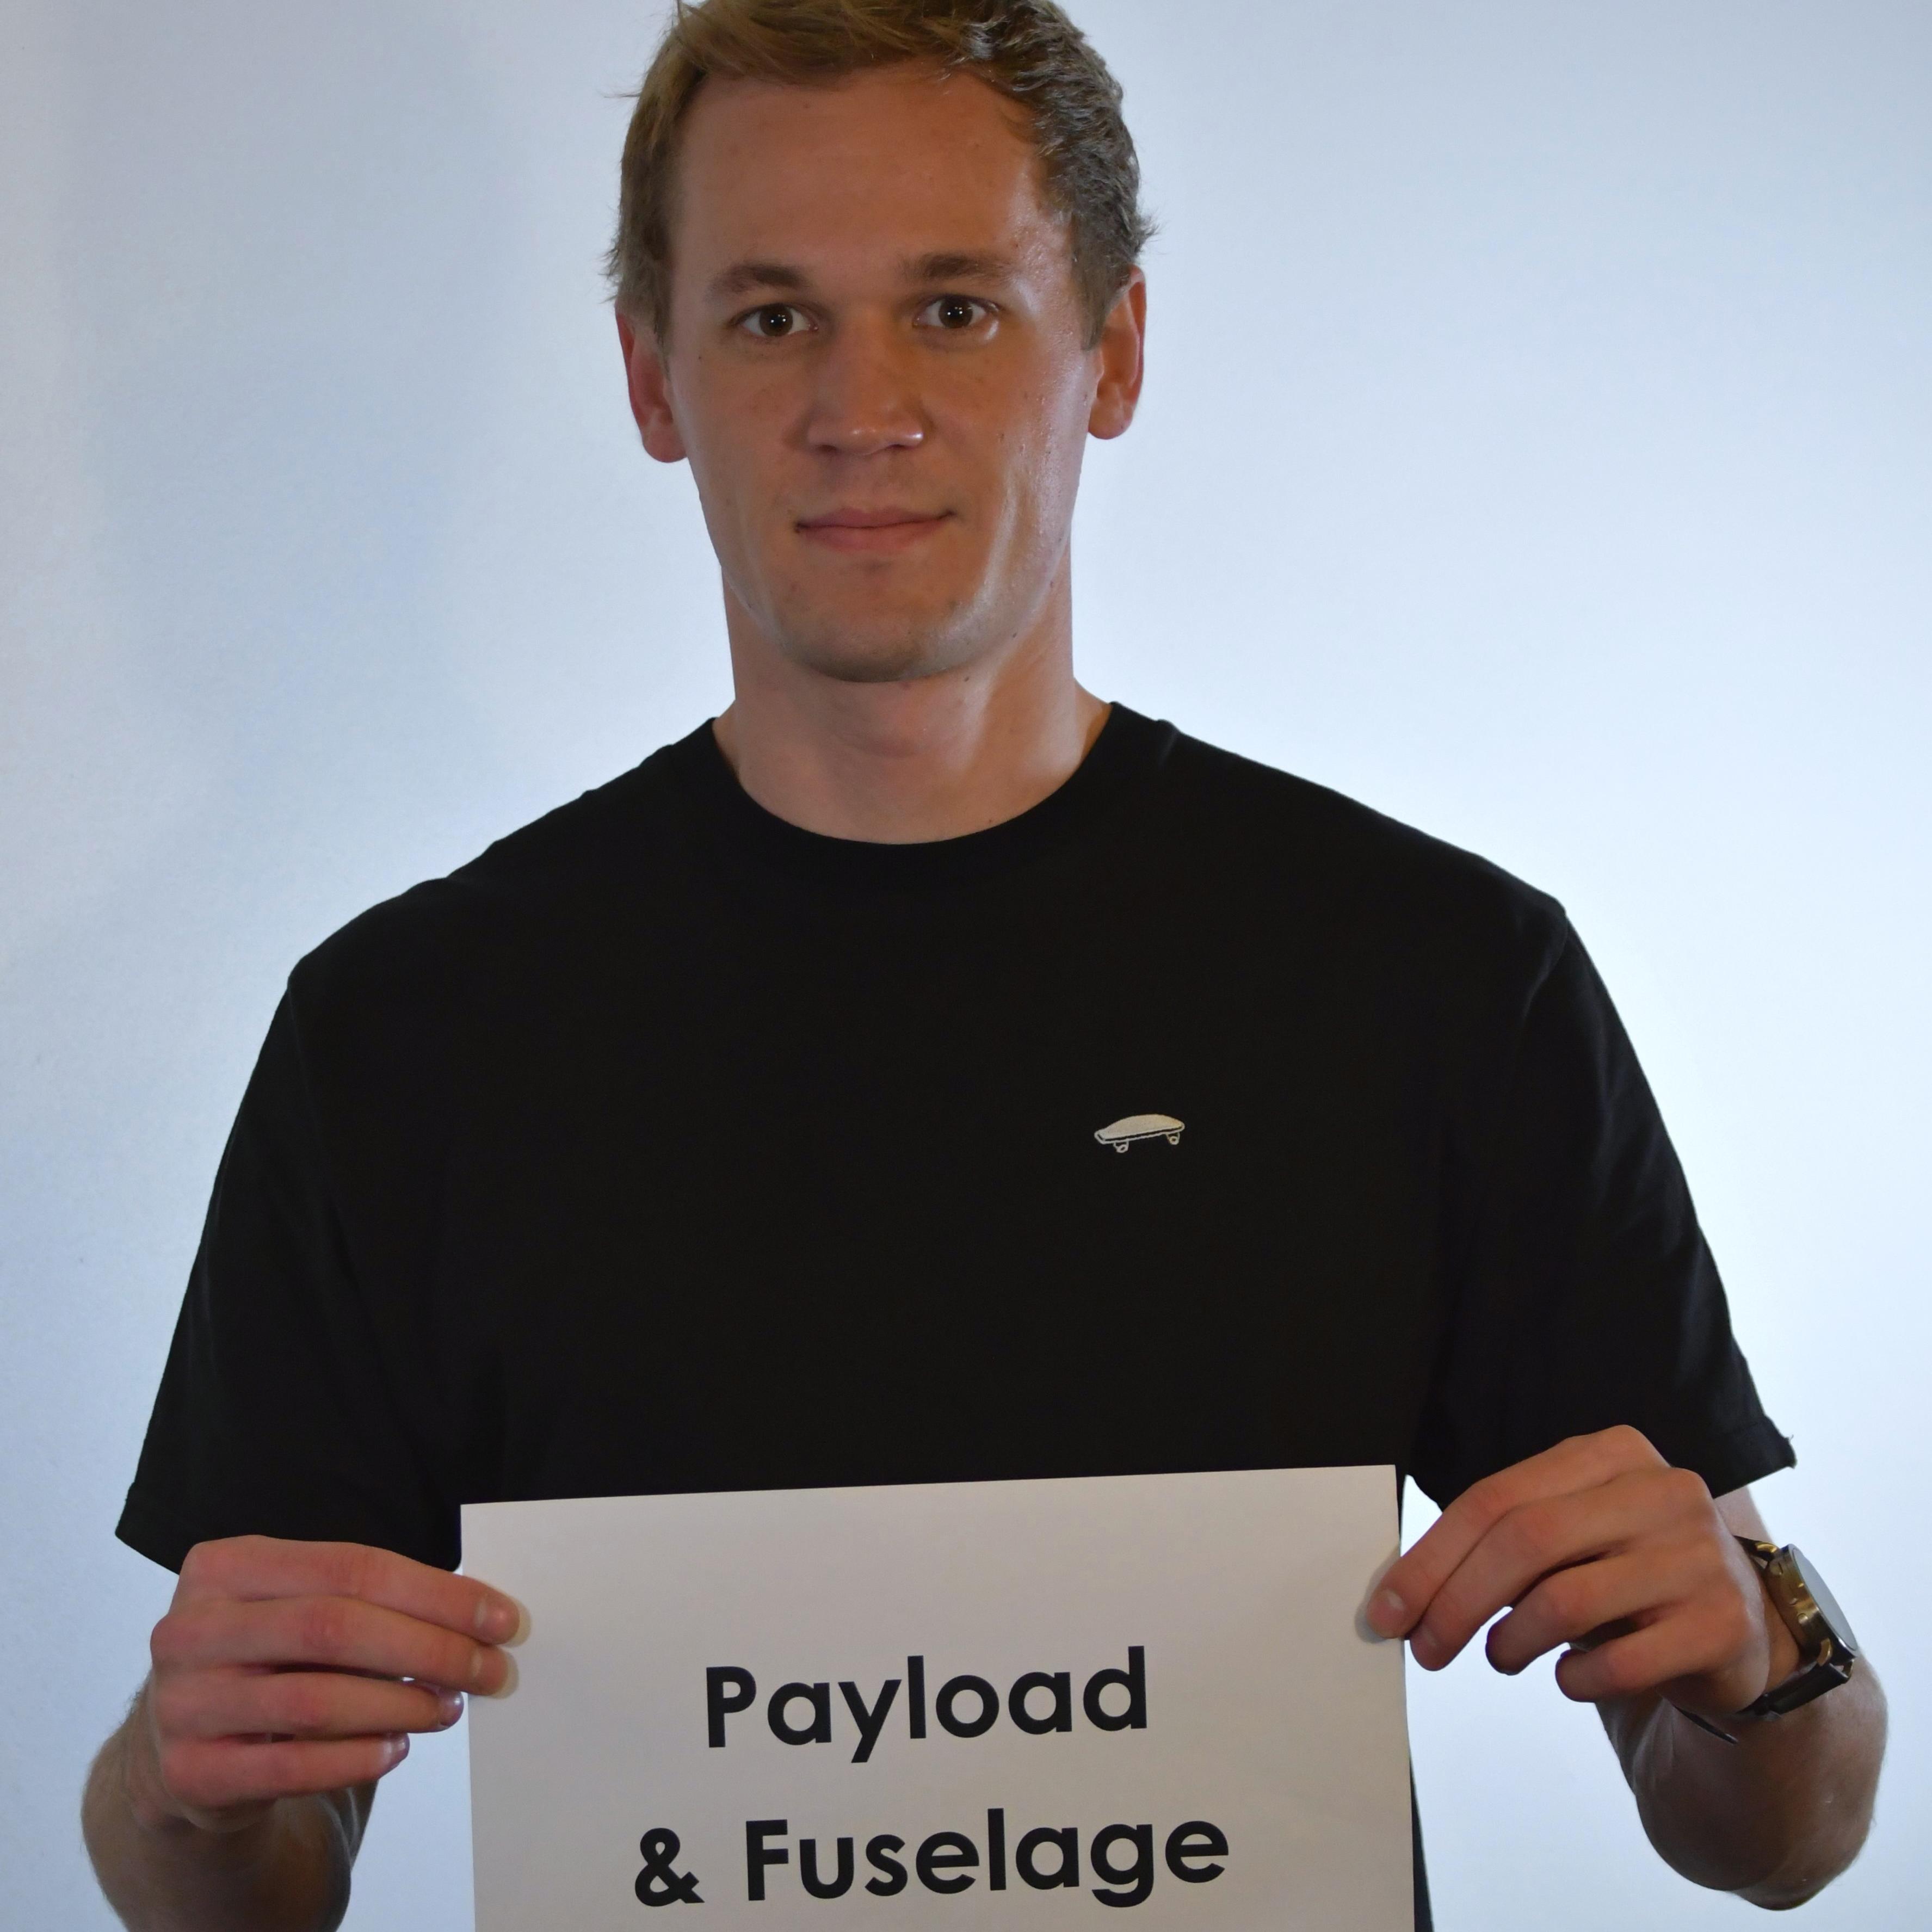 Patrik Lienbacher – Subteamleader Payload & Fuselage